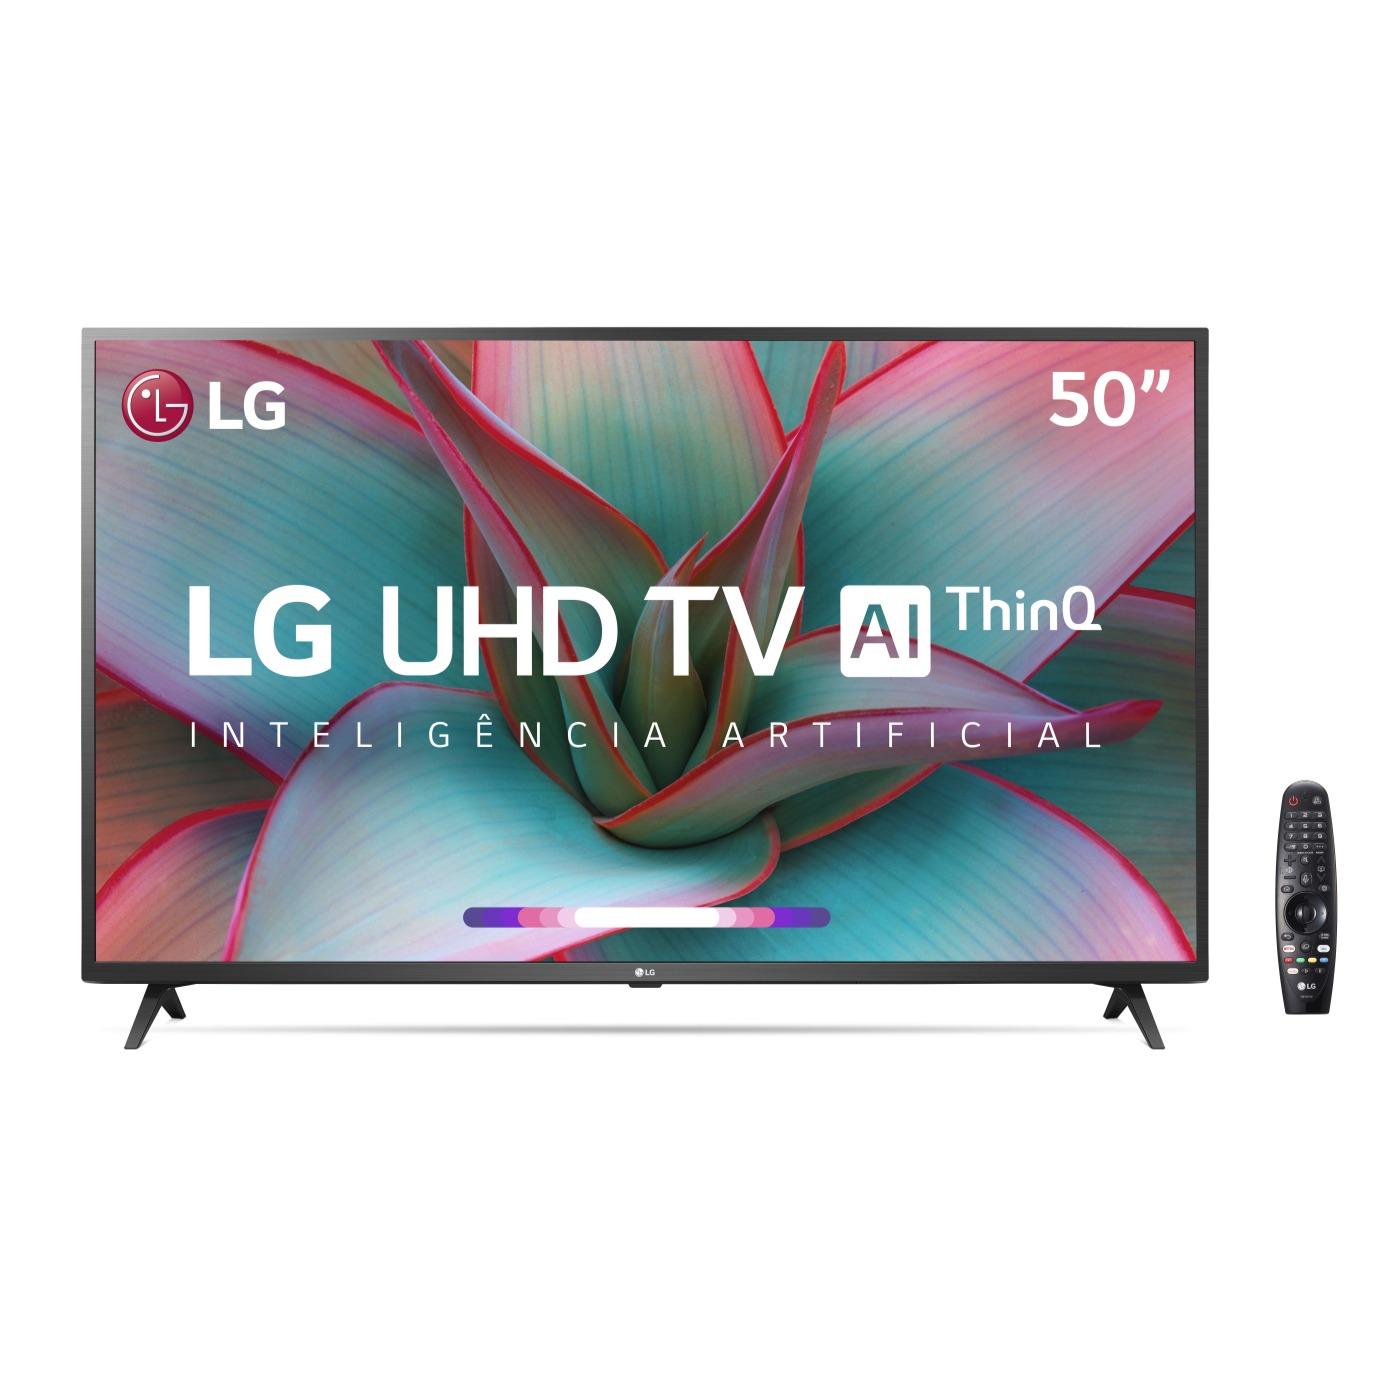 Smart TV LED 50 LG 4KUltra HD ThinQ AI HDR10 AI Sound - Wi-Fi 3 HDMI 2 USB Bluetooth- 50UN7310PSC